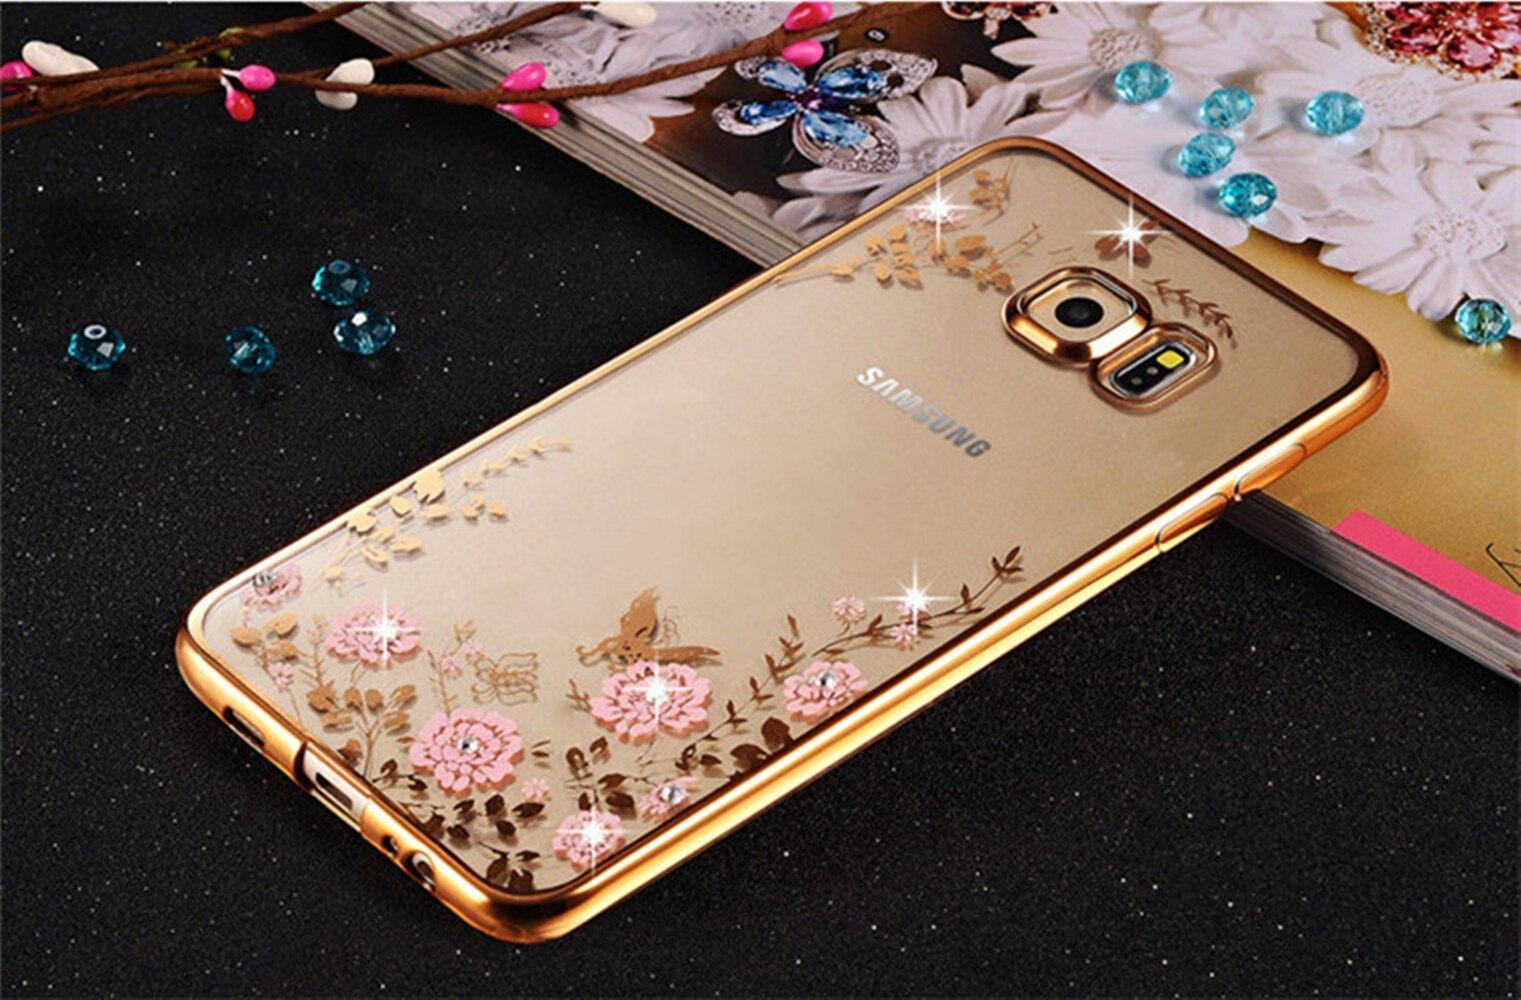 Luxury Diamond Flowers Back Cover Soft TPU Phone Case For Samsung Galaxy J1 J2 J3 J5 J7 Prime A3